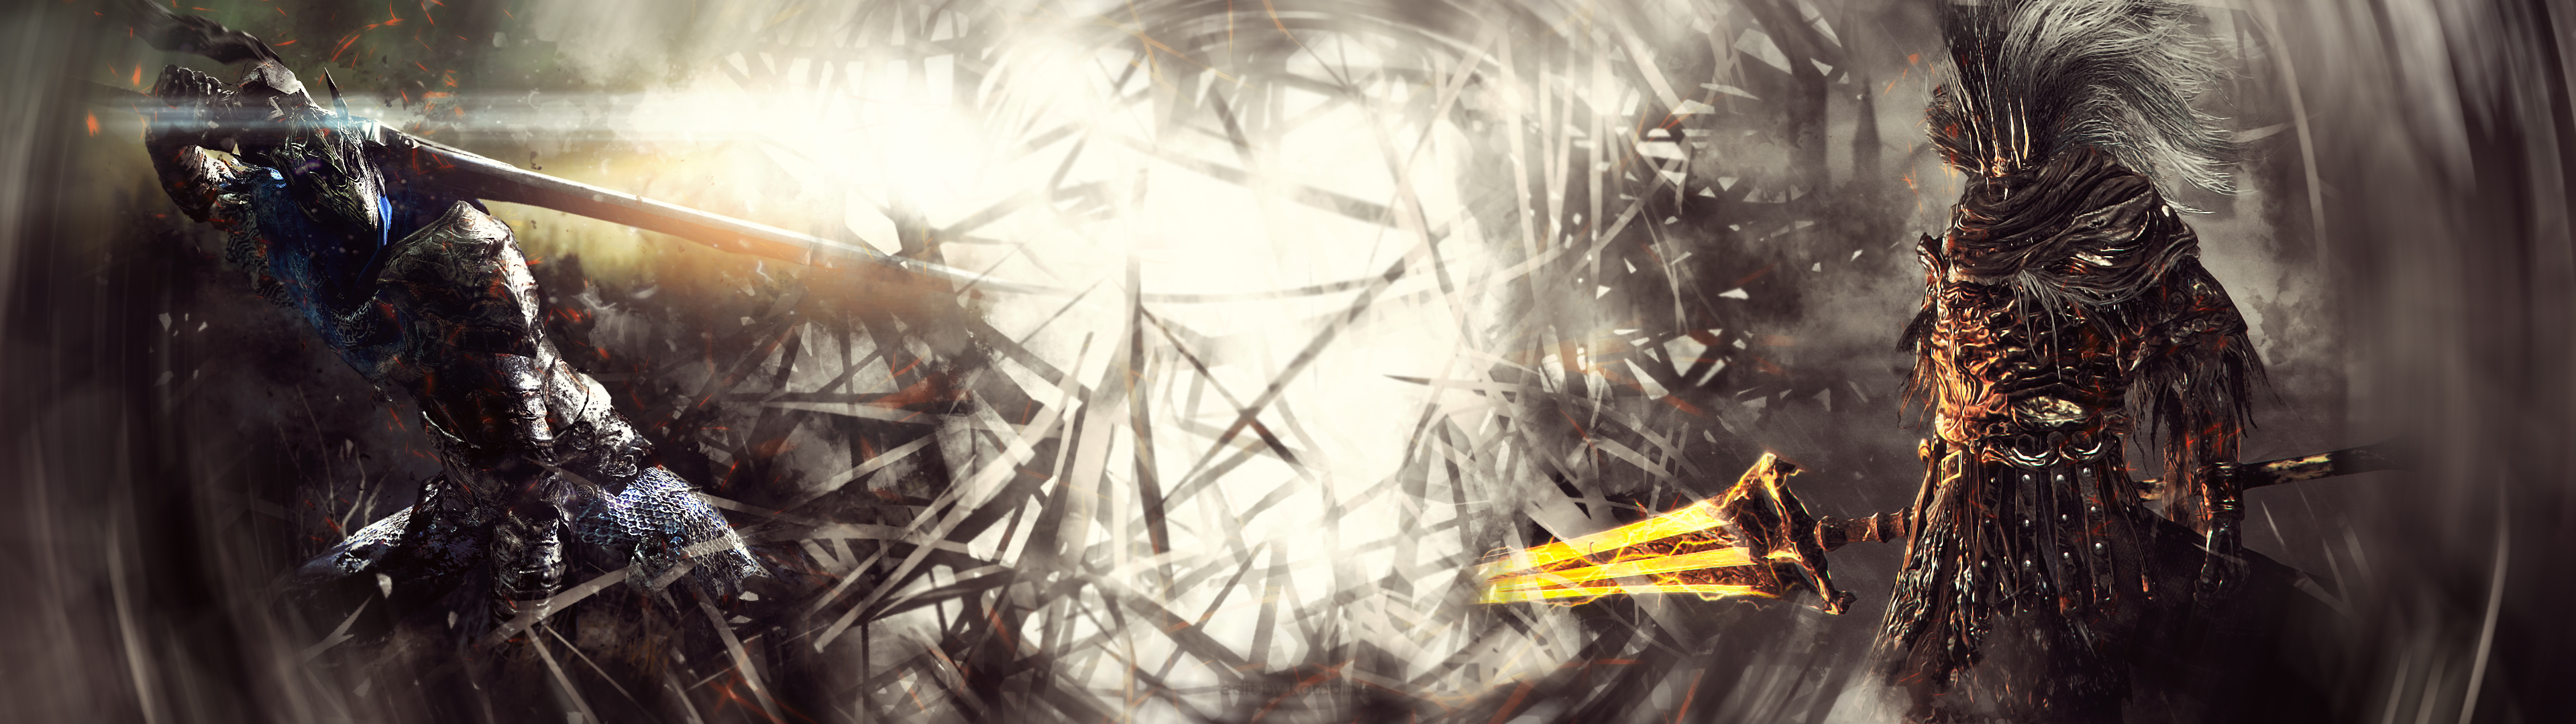 Artorias The Abyss Walker Vs Nameless King By Kampinis On Deviantart